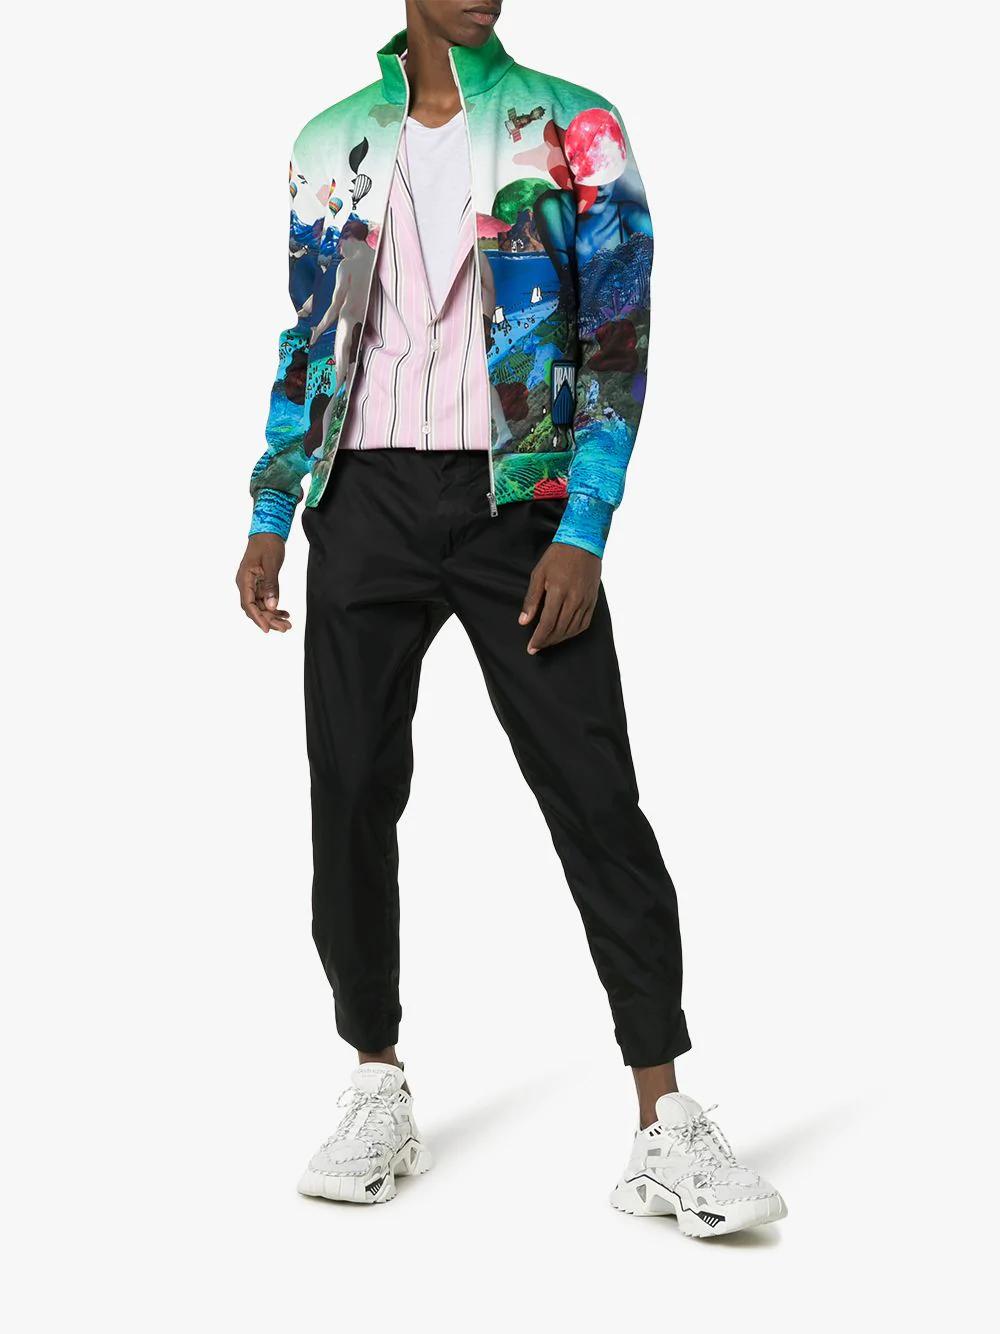 9620c6f280 Prada Flashback Print High Neck Bomber Jacket In F0136 Blue White. Browns  Fashion